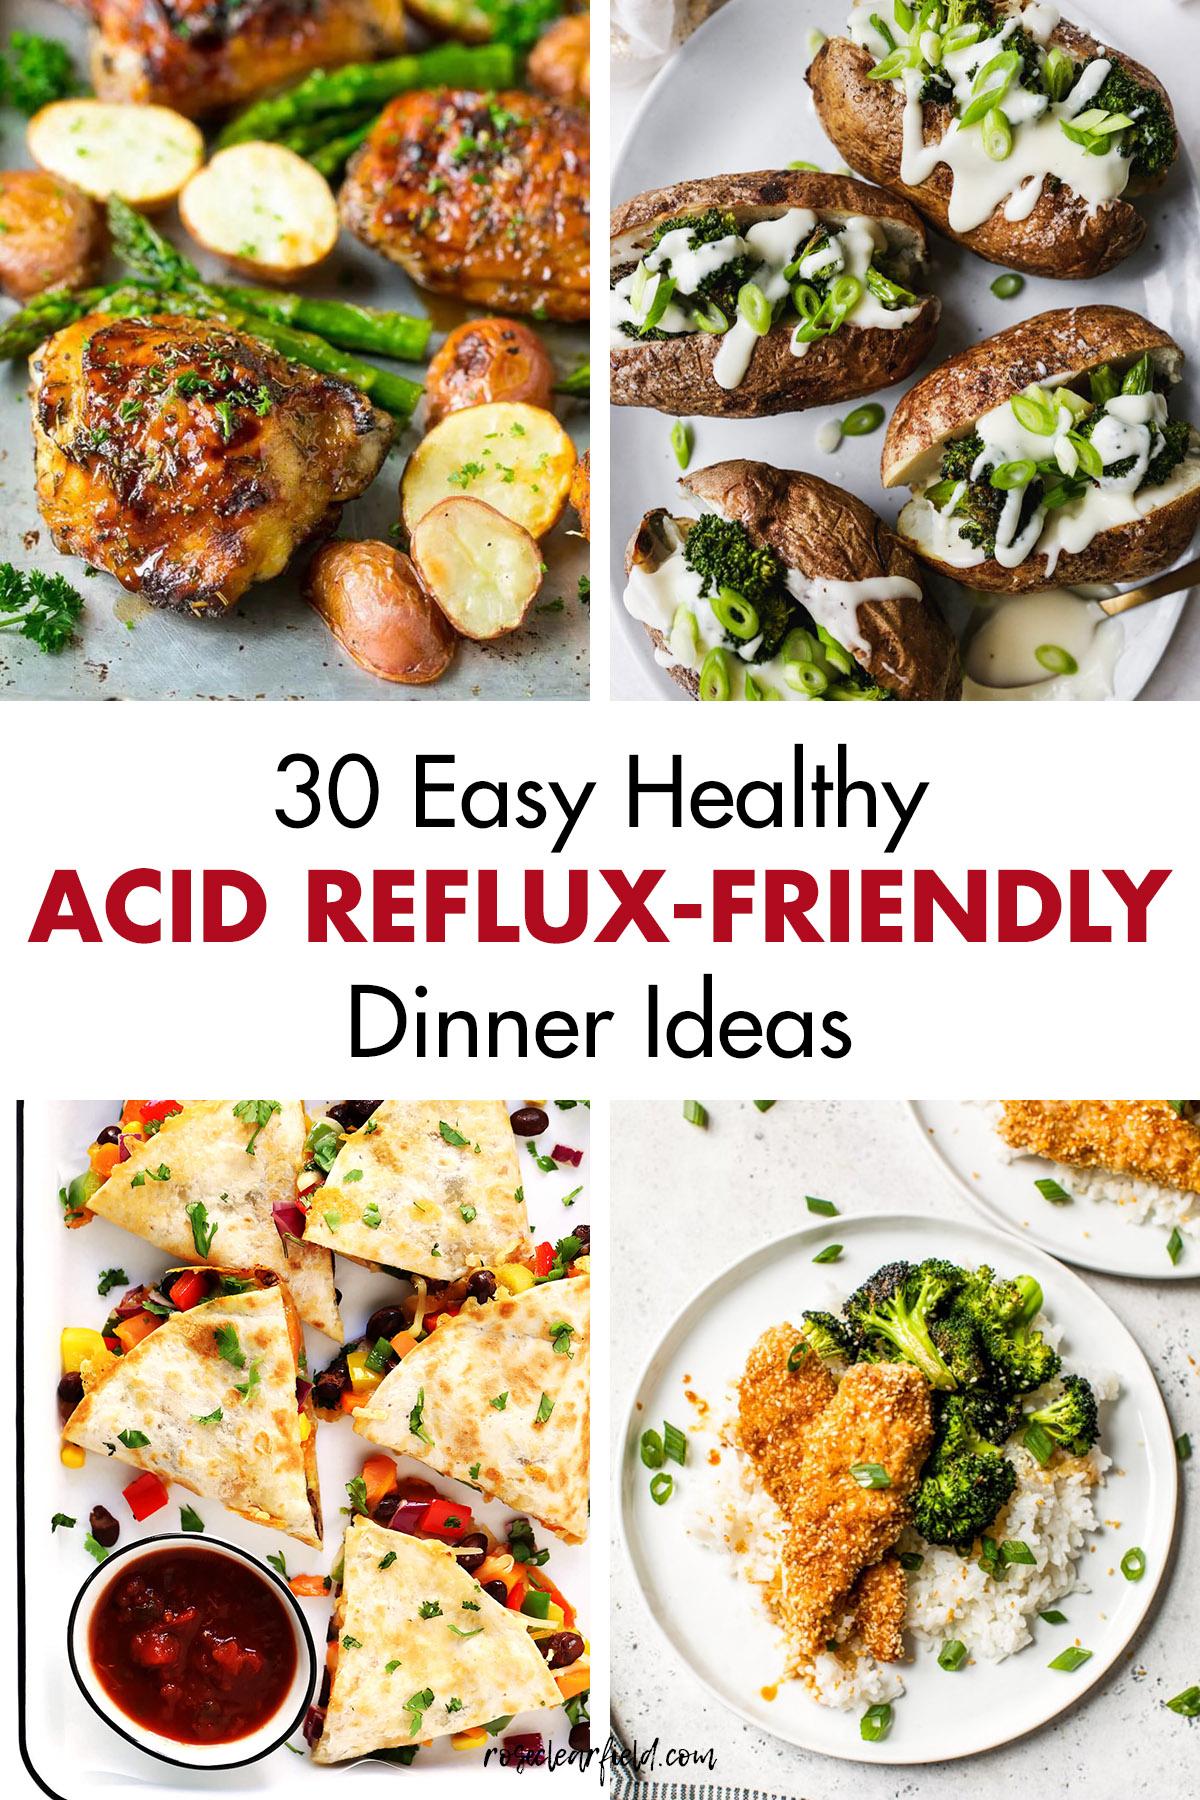 30 Easy Healthy Acid Reflux Friendly Dinner Ideas Rose Clearfield